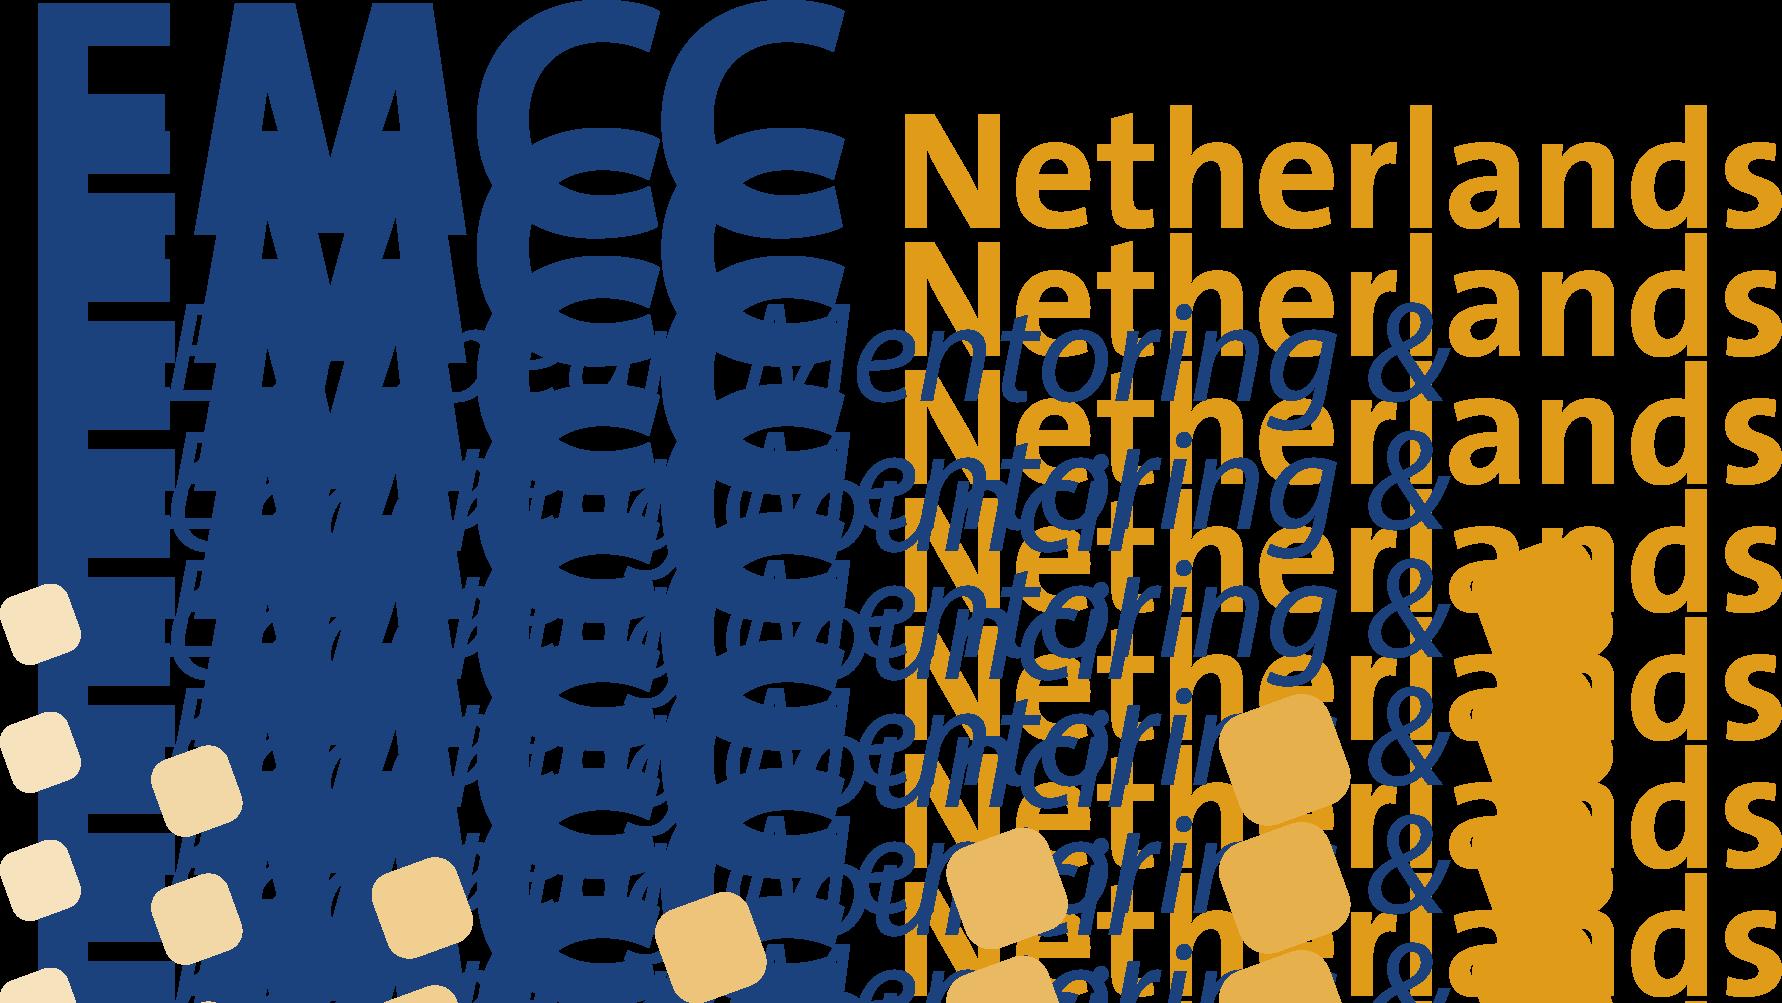 emcc-logo-netherlands